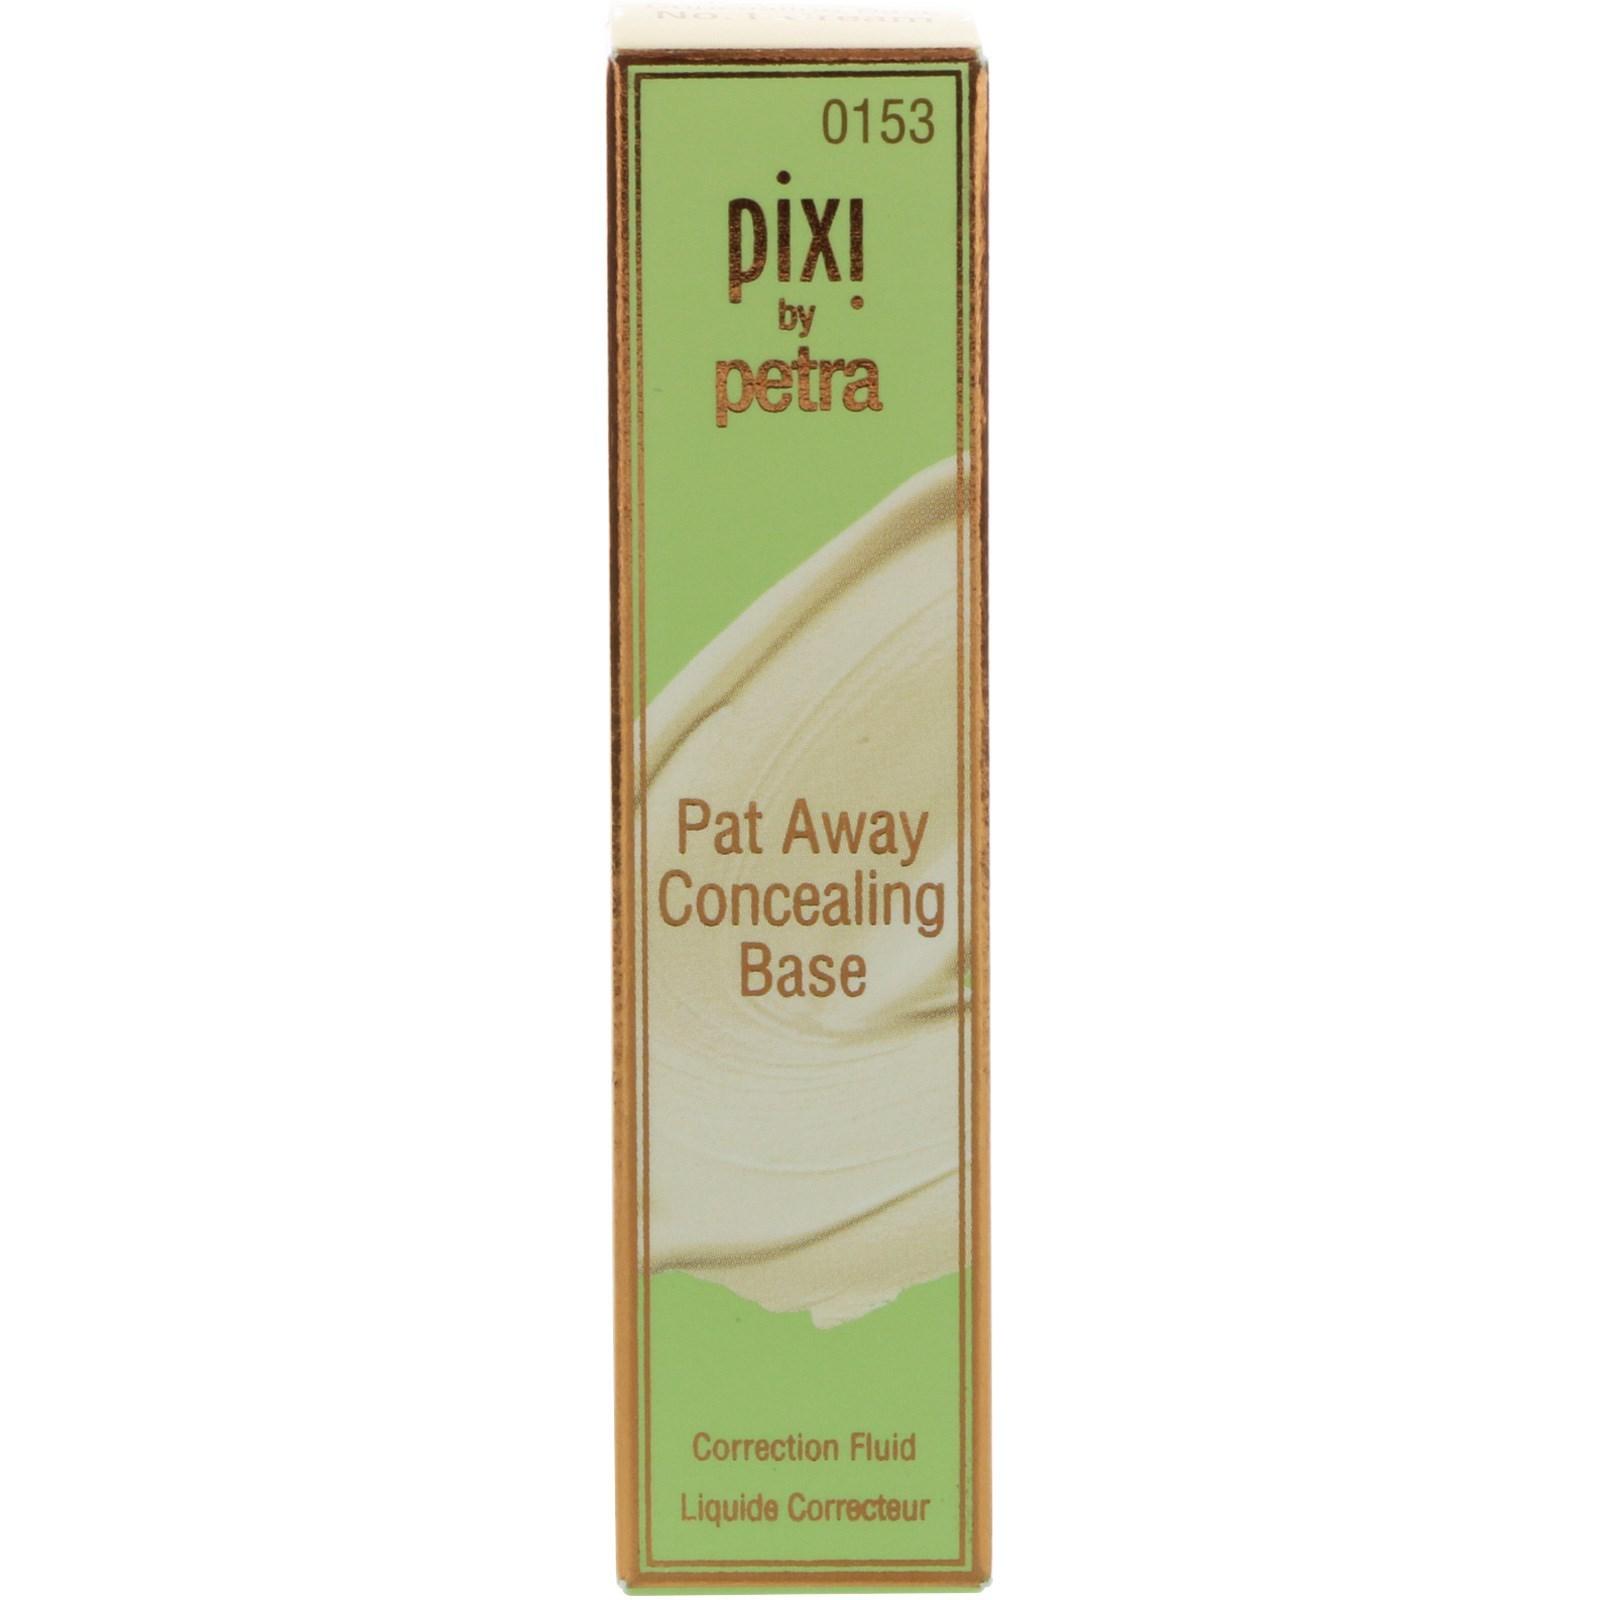 Pixi Beauty, Pat Away Concealing Base, No. 1 Cream, 0.13 oz(pack of 4) Anti-Aging Peeling Gel (4oz)